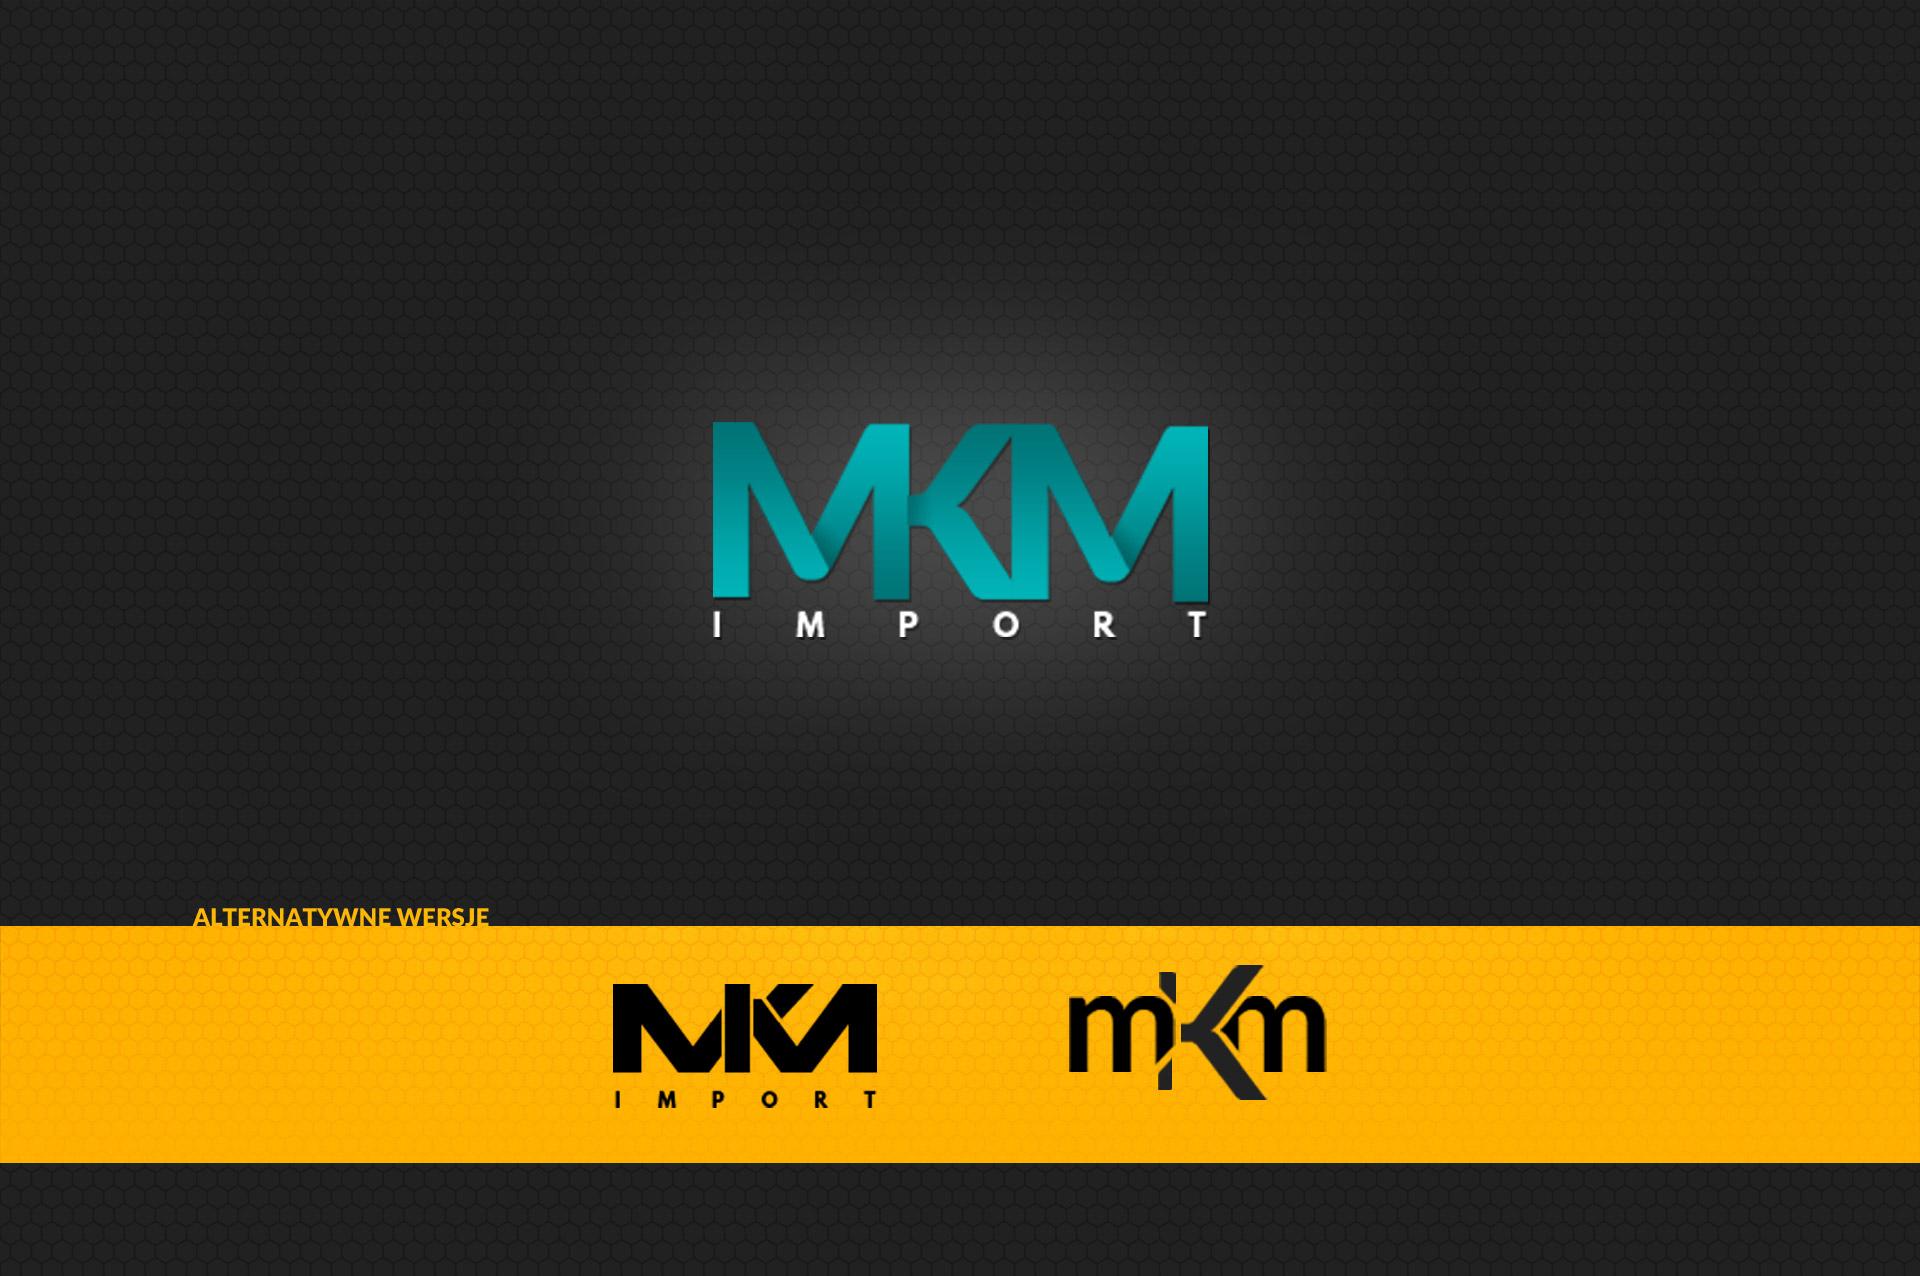 logo mkm import